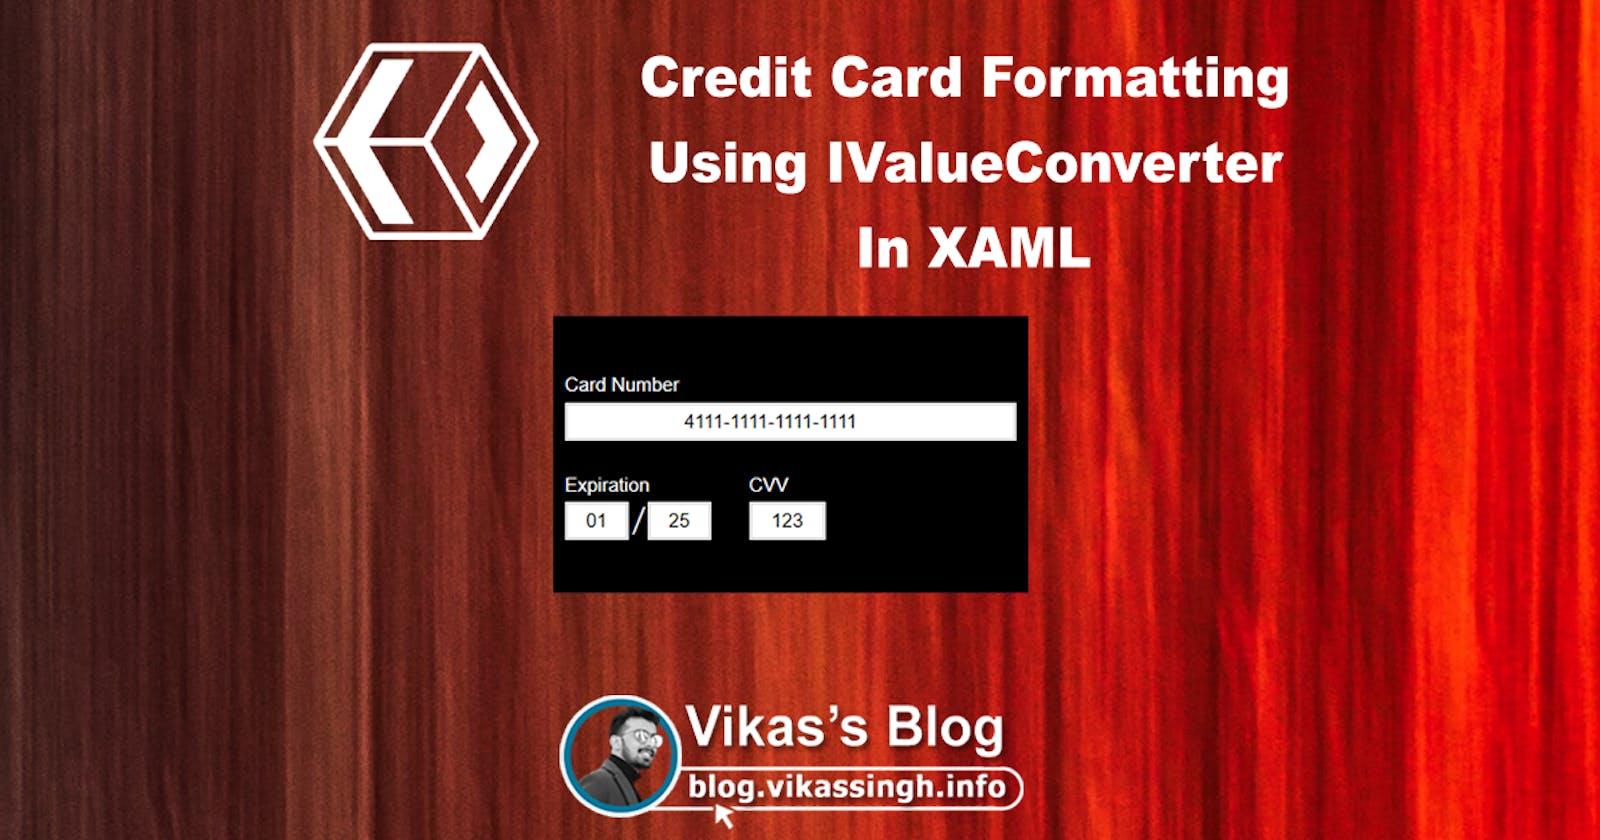 Credit Card Formatting Using IValueConverter In XAML